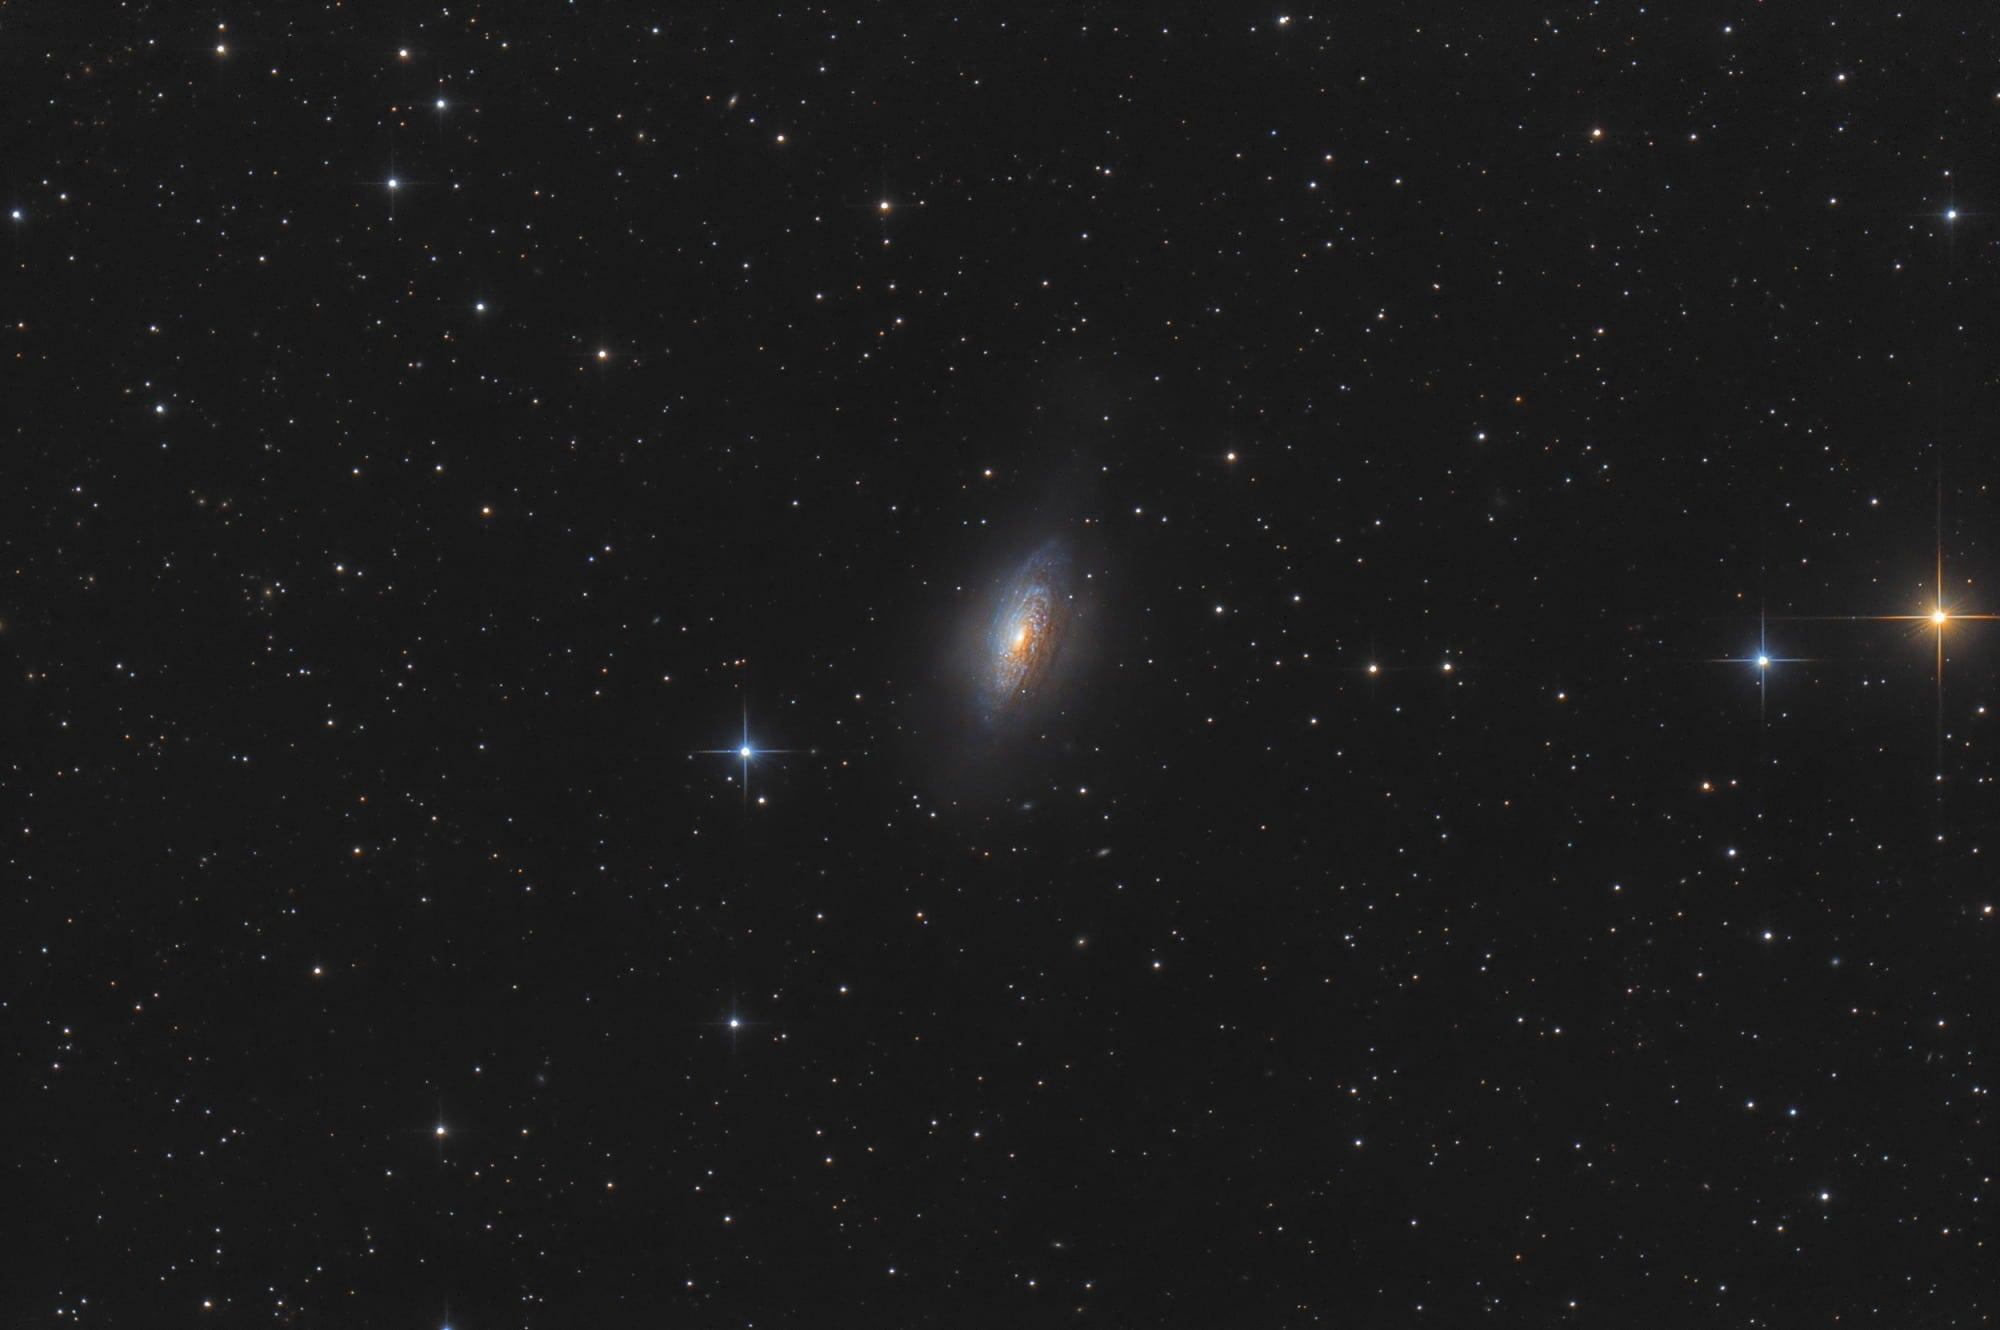 NGC 3521 - Galaxie im Löwen